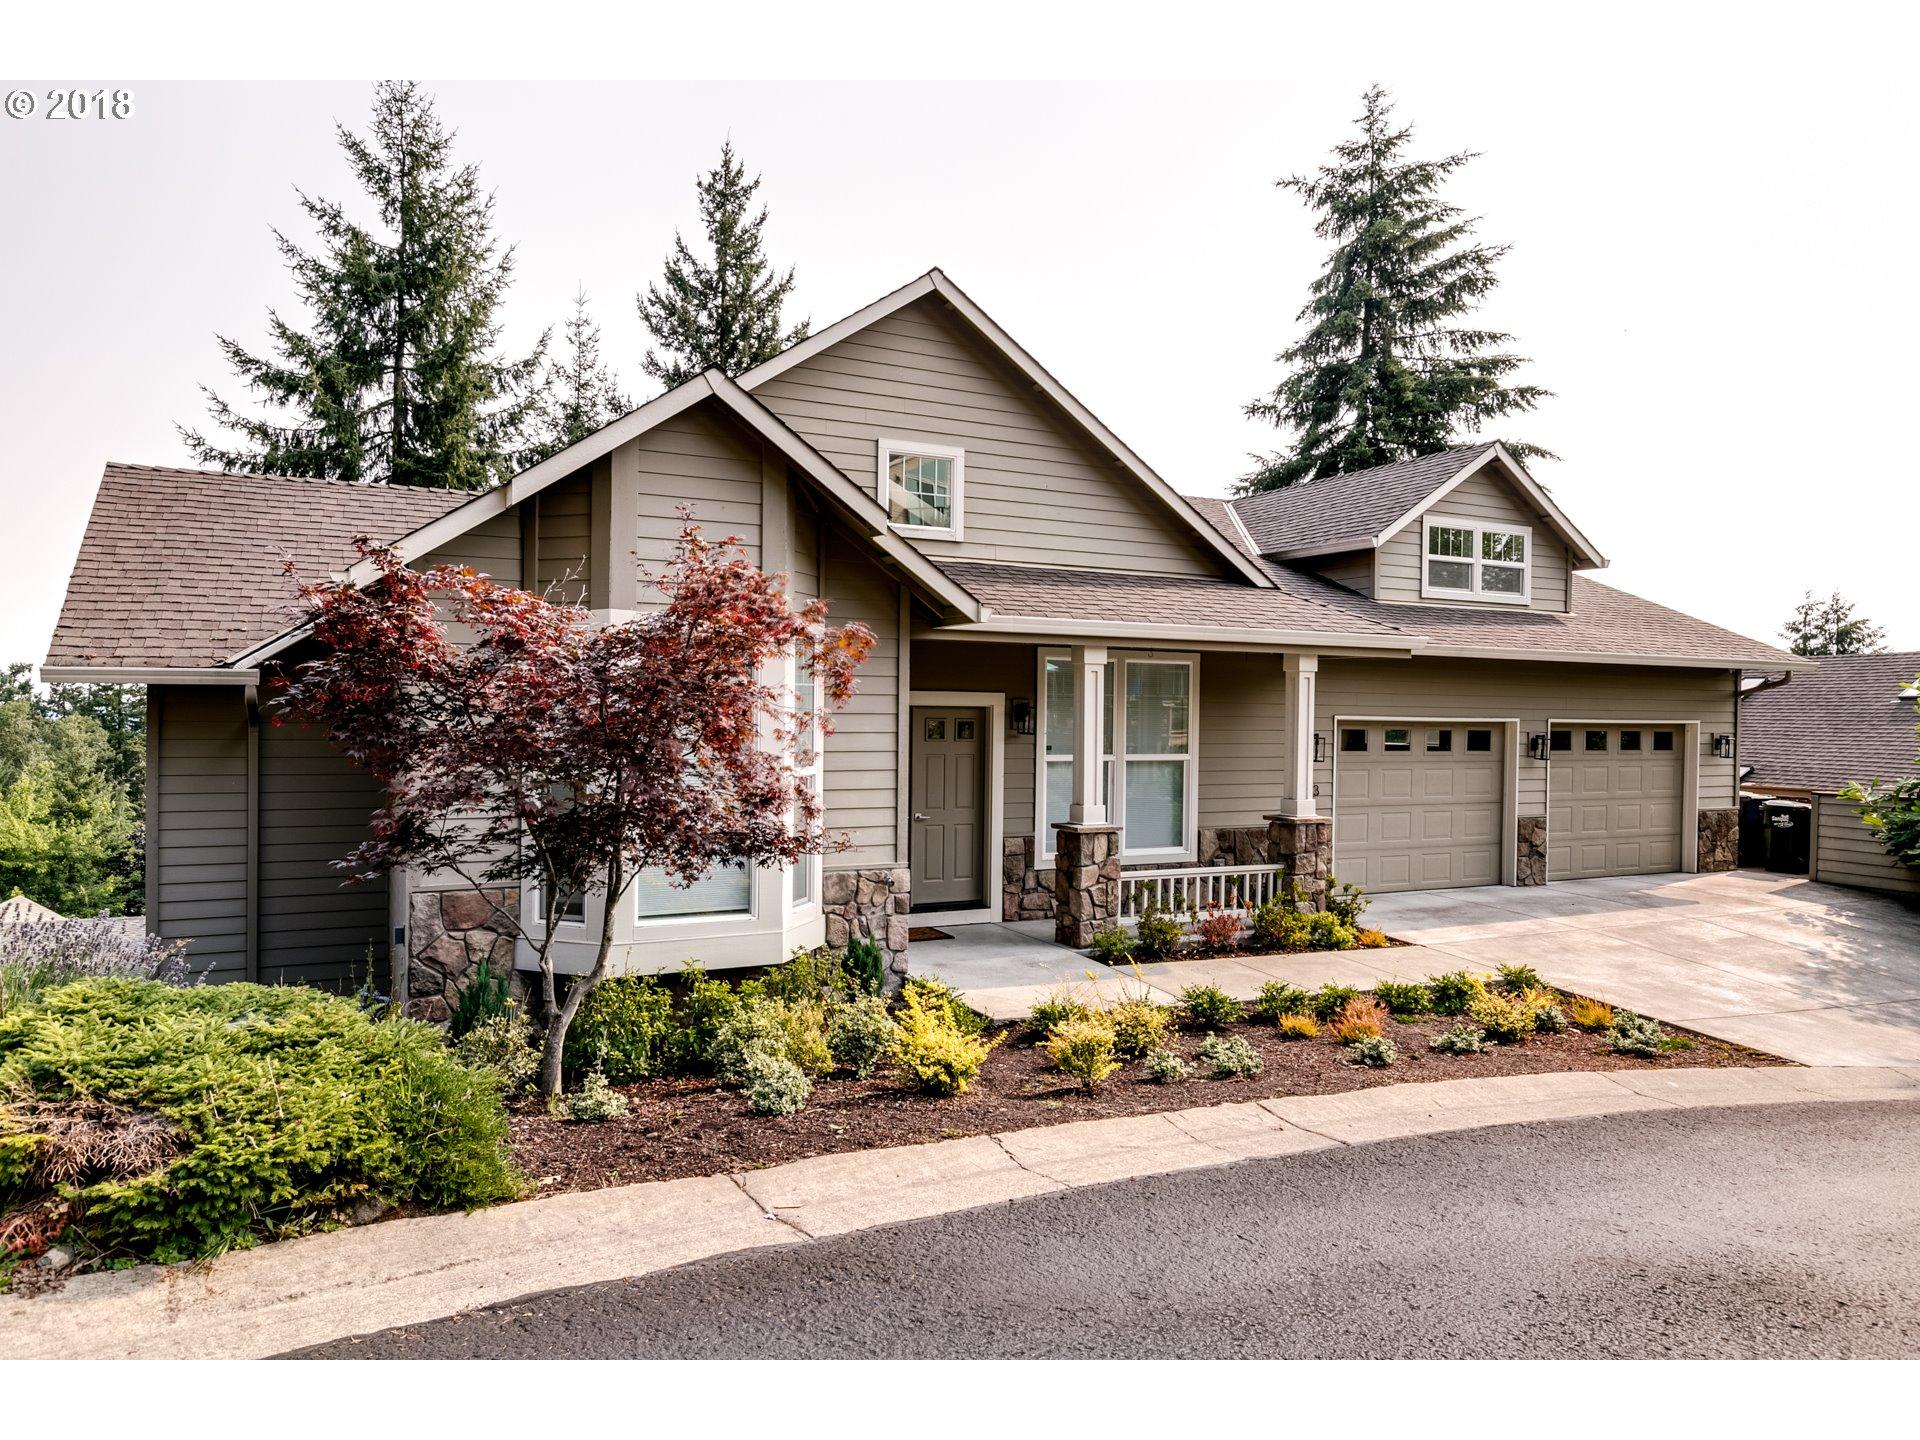 3343 BENTLEY AVE Eugene, OR 97405 - MLS #: 18600488